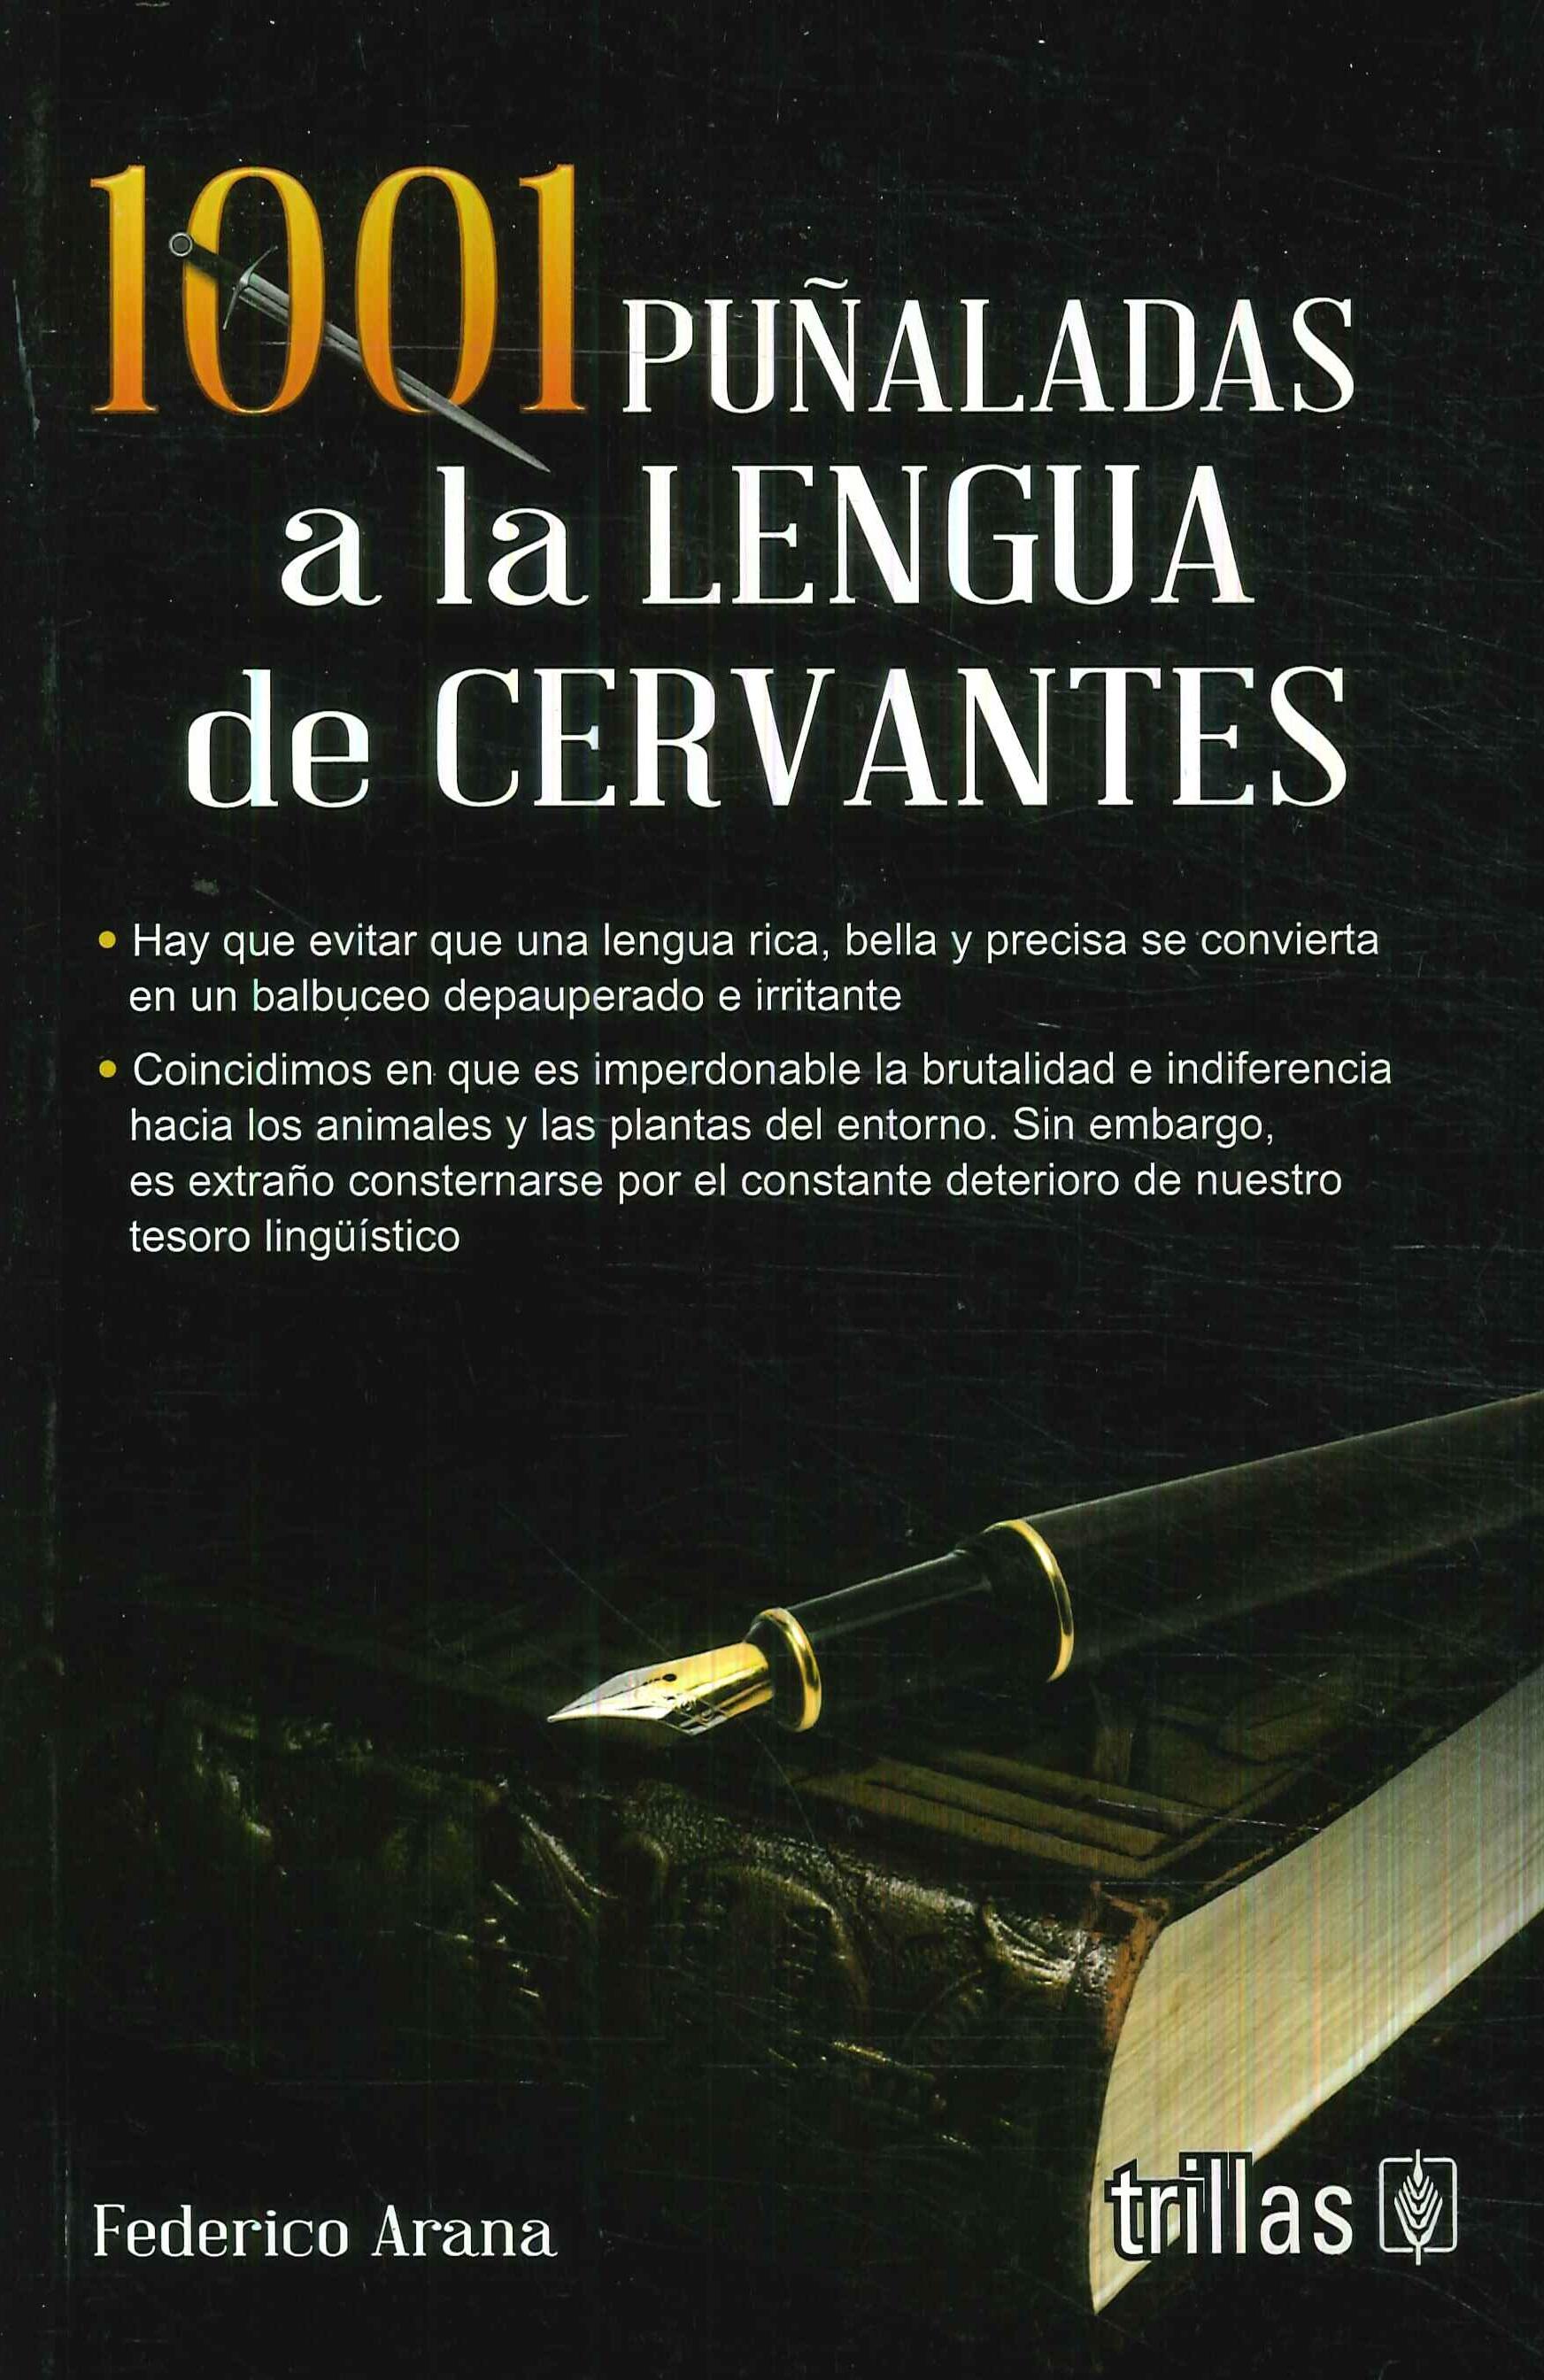 1001 Puñaladas a la Lengua de Cervantes